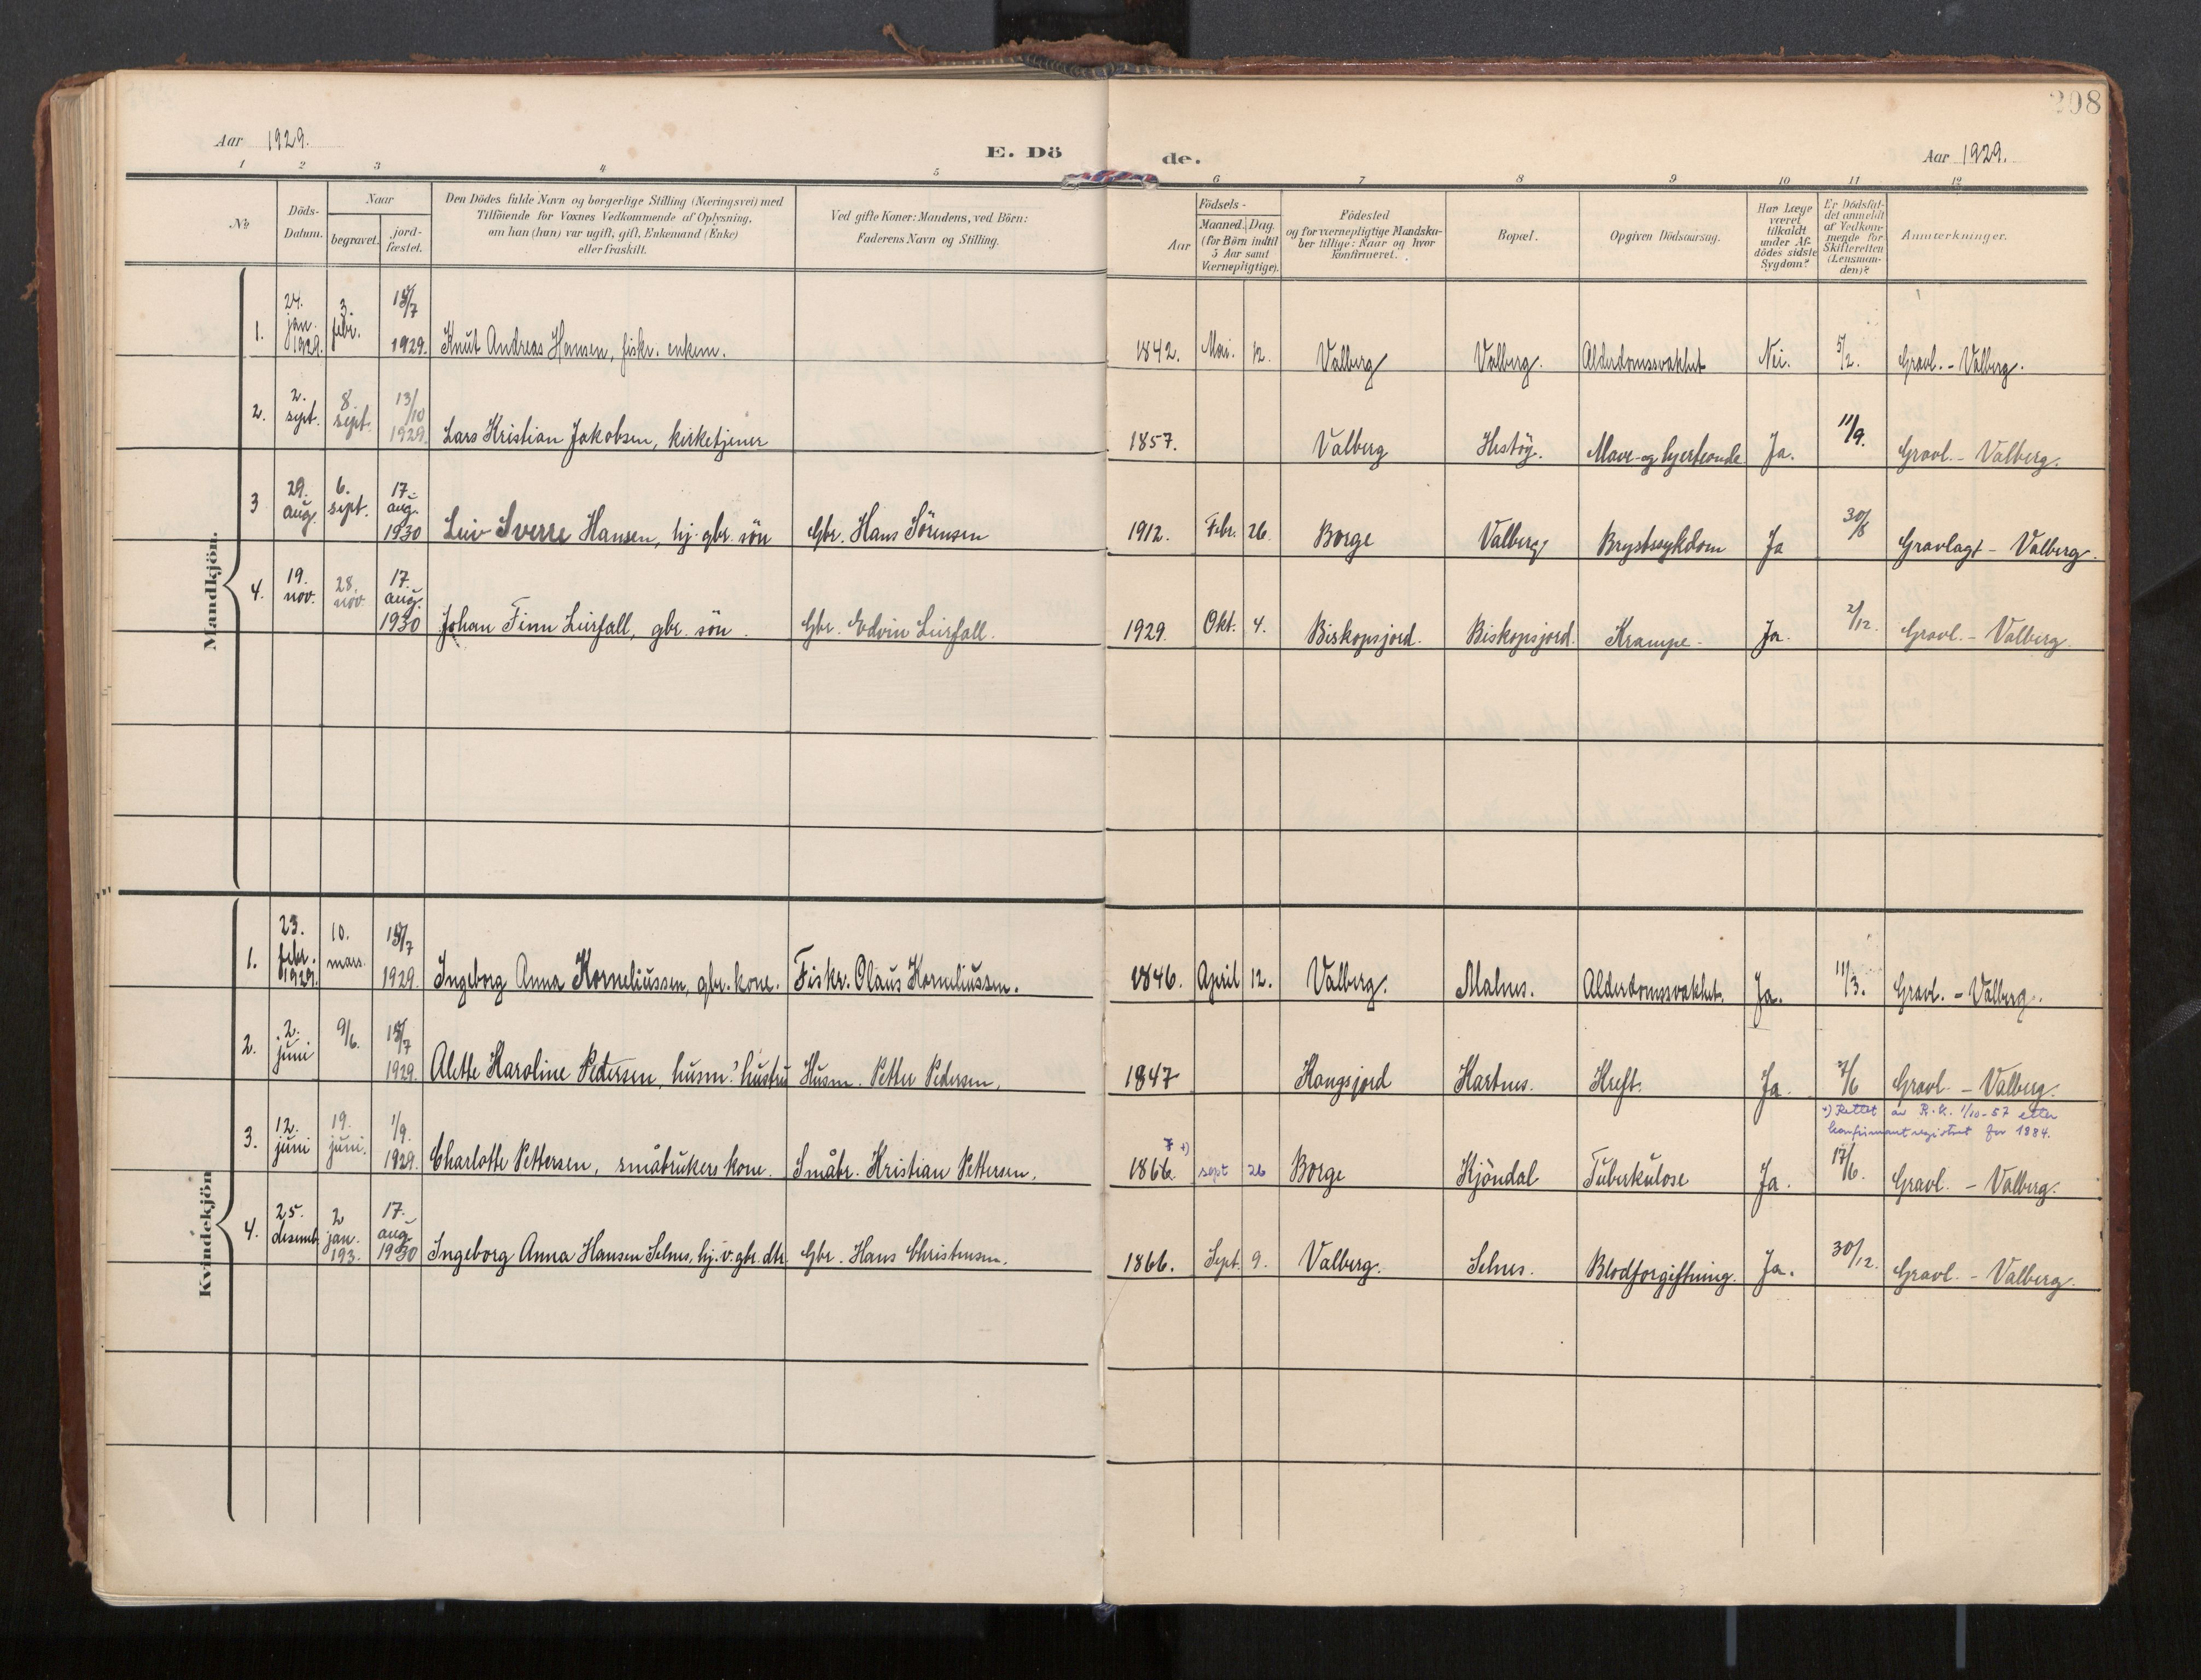 SAT, Ministerialprotokoller, klokkerbøker og fødselsregistre - Nordland, 884/L1194: Ministerialbok nr. 884A02, 1906-1937, s. 208